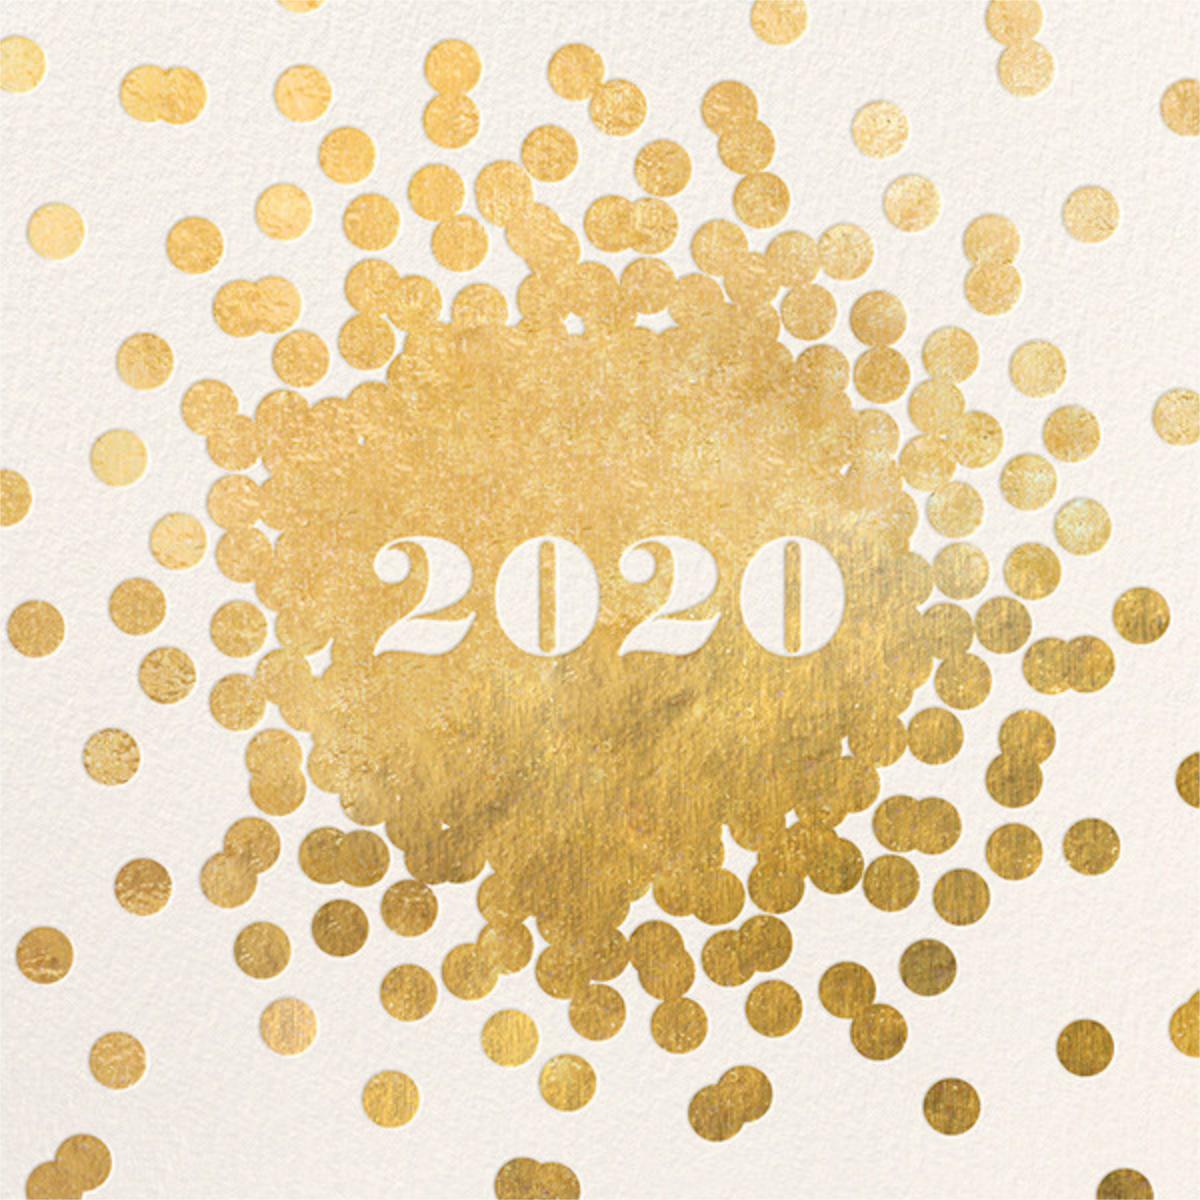 Confetti New Year (Invitation) - Gold/Cream - kate spade new york - New Year's Eve